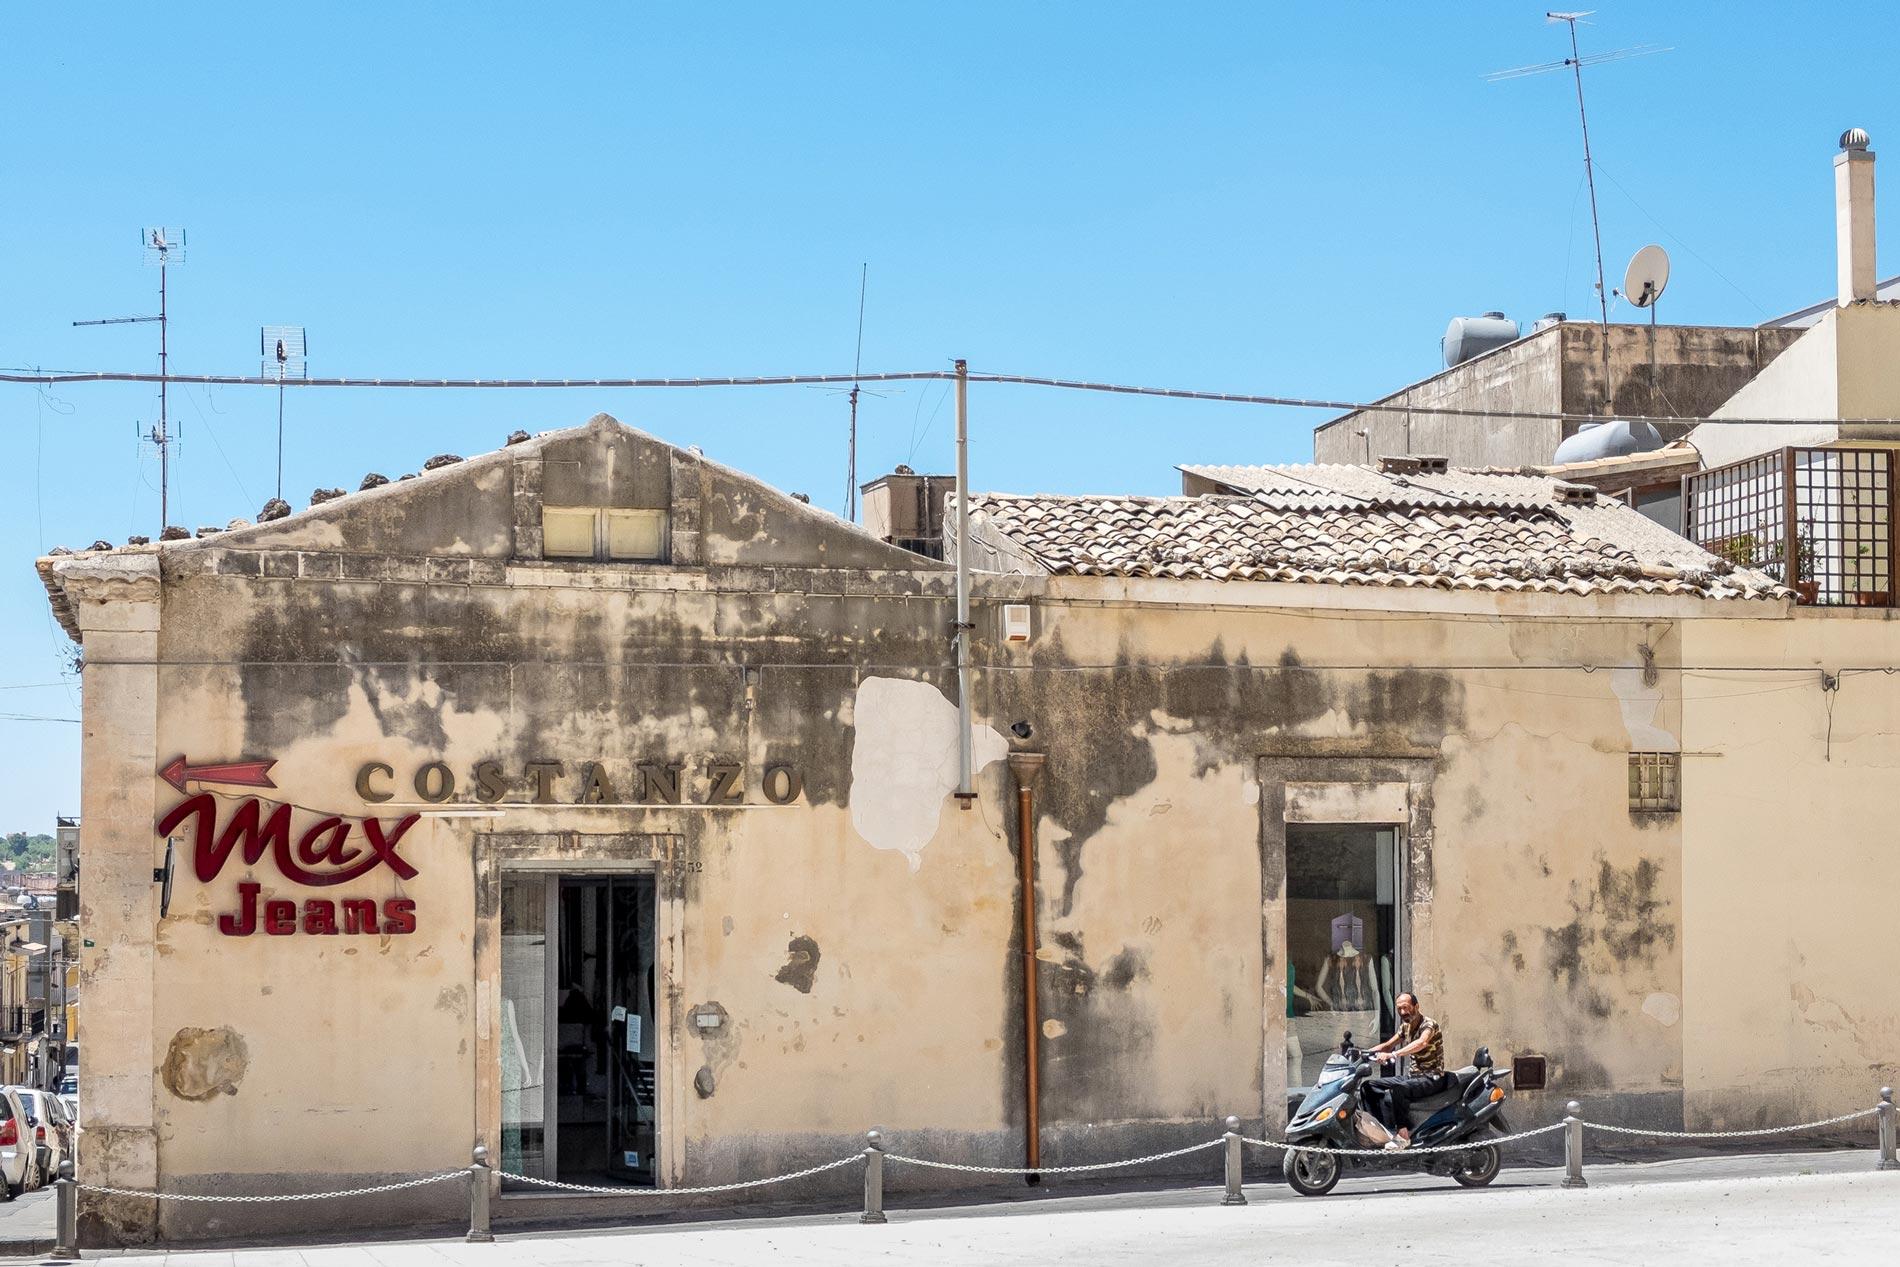 Max Jeans - Noto, Sicily